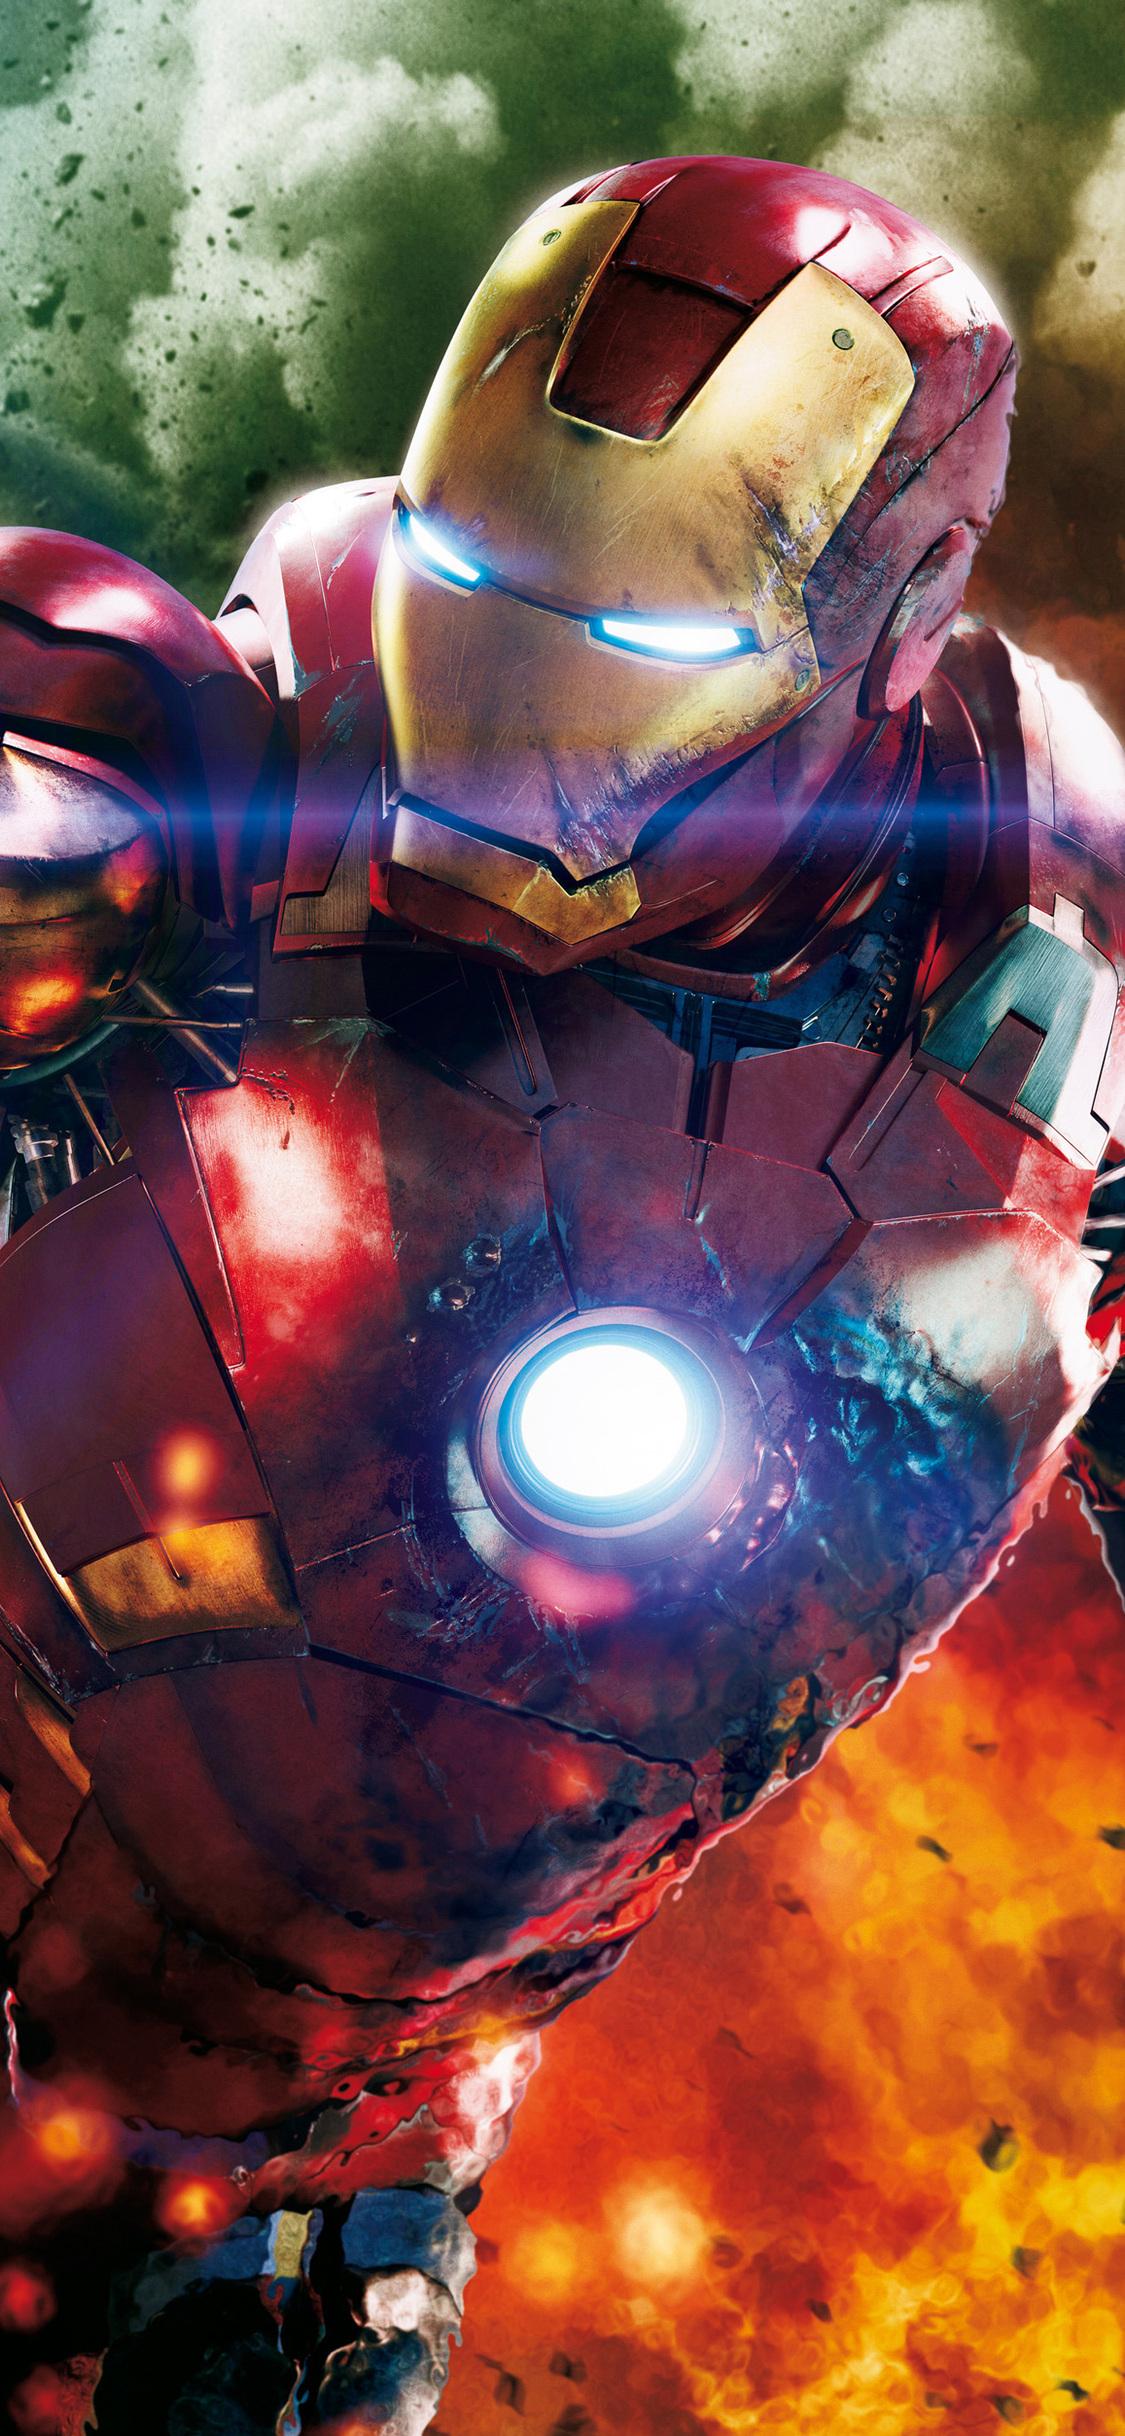 1125x2436 Iron Man Hulk 5k 8k Iphone XS,Iphone 10,Iphone X ...